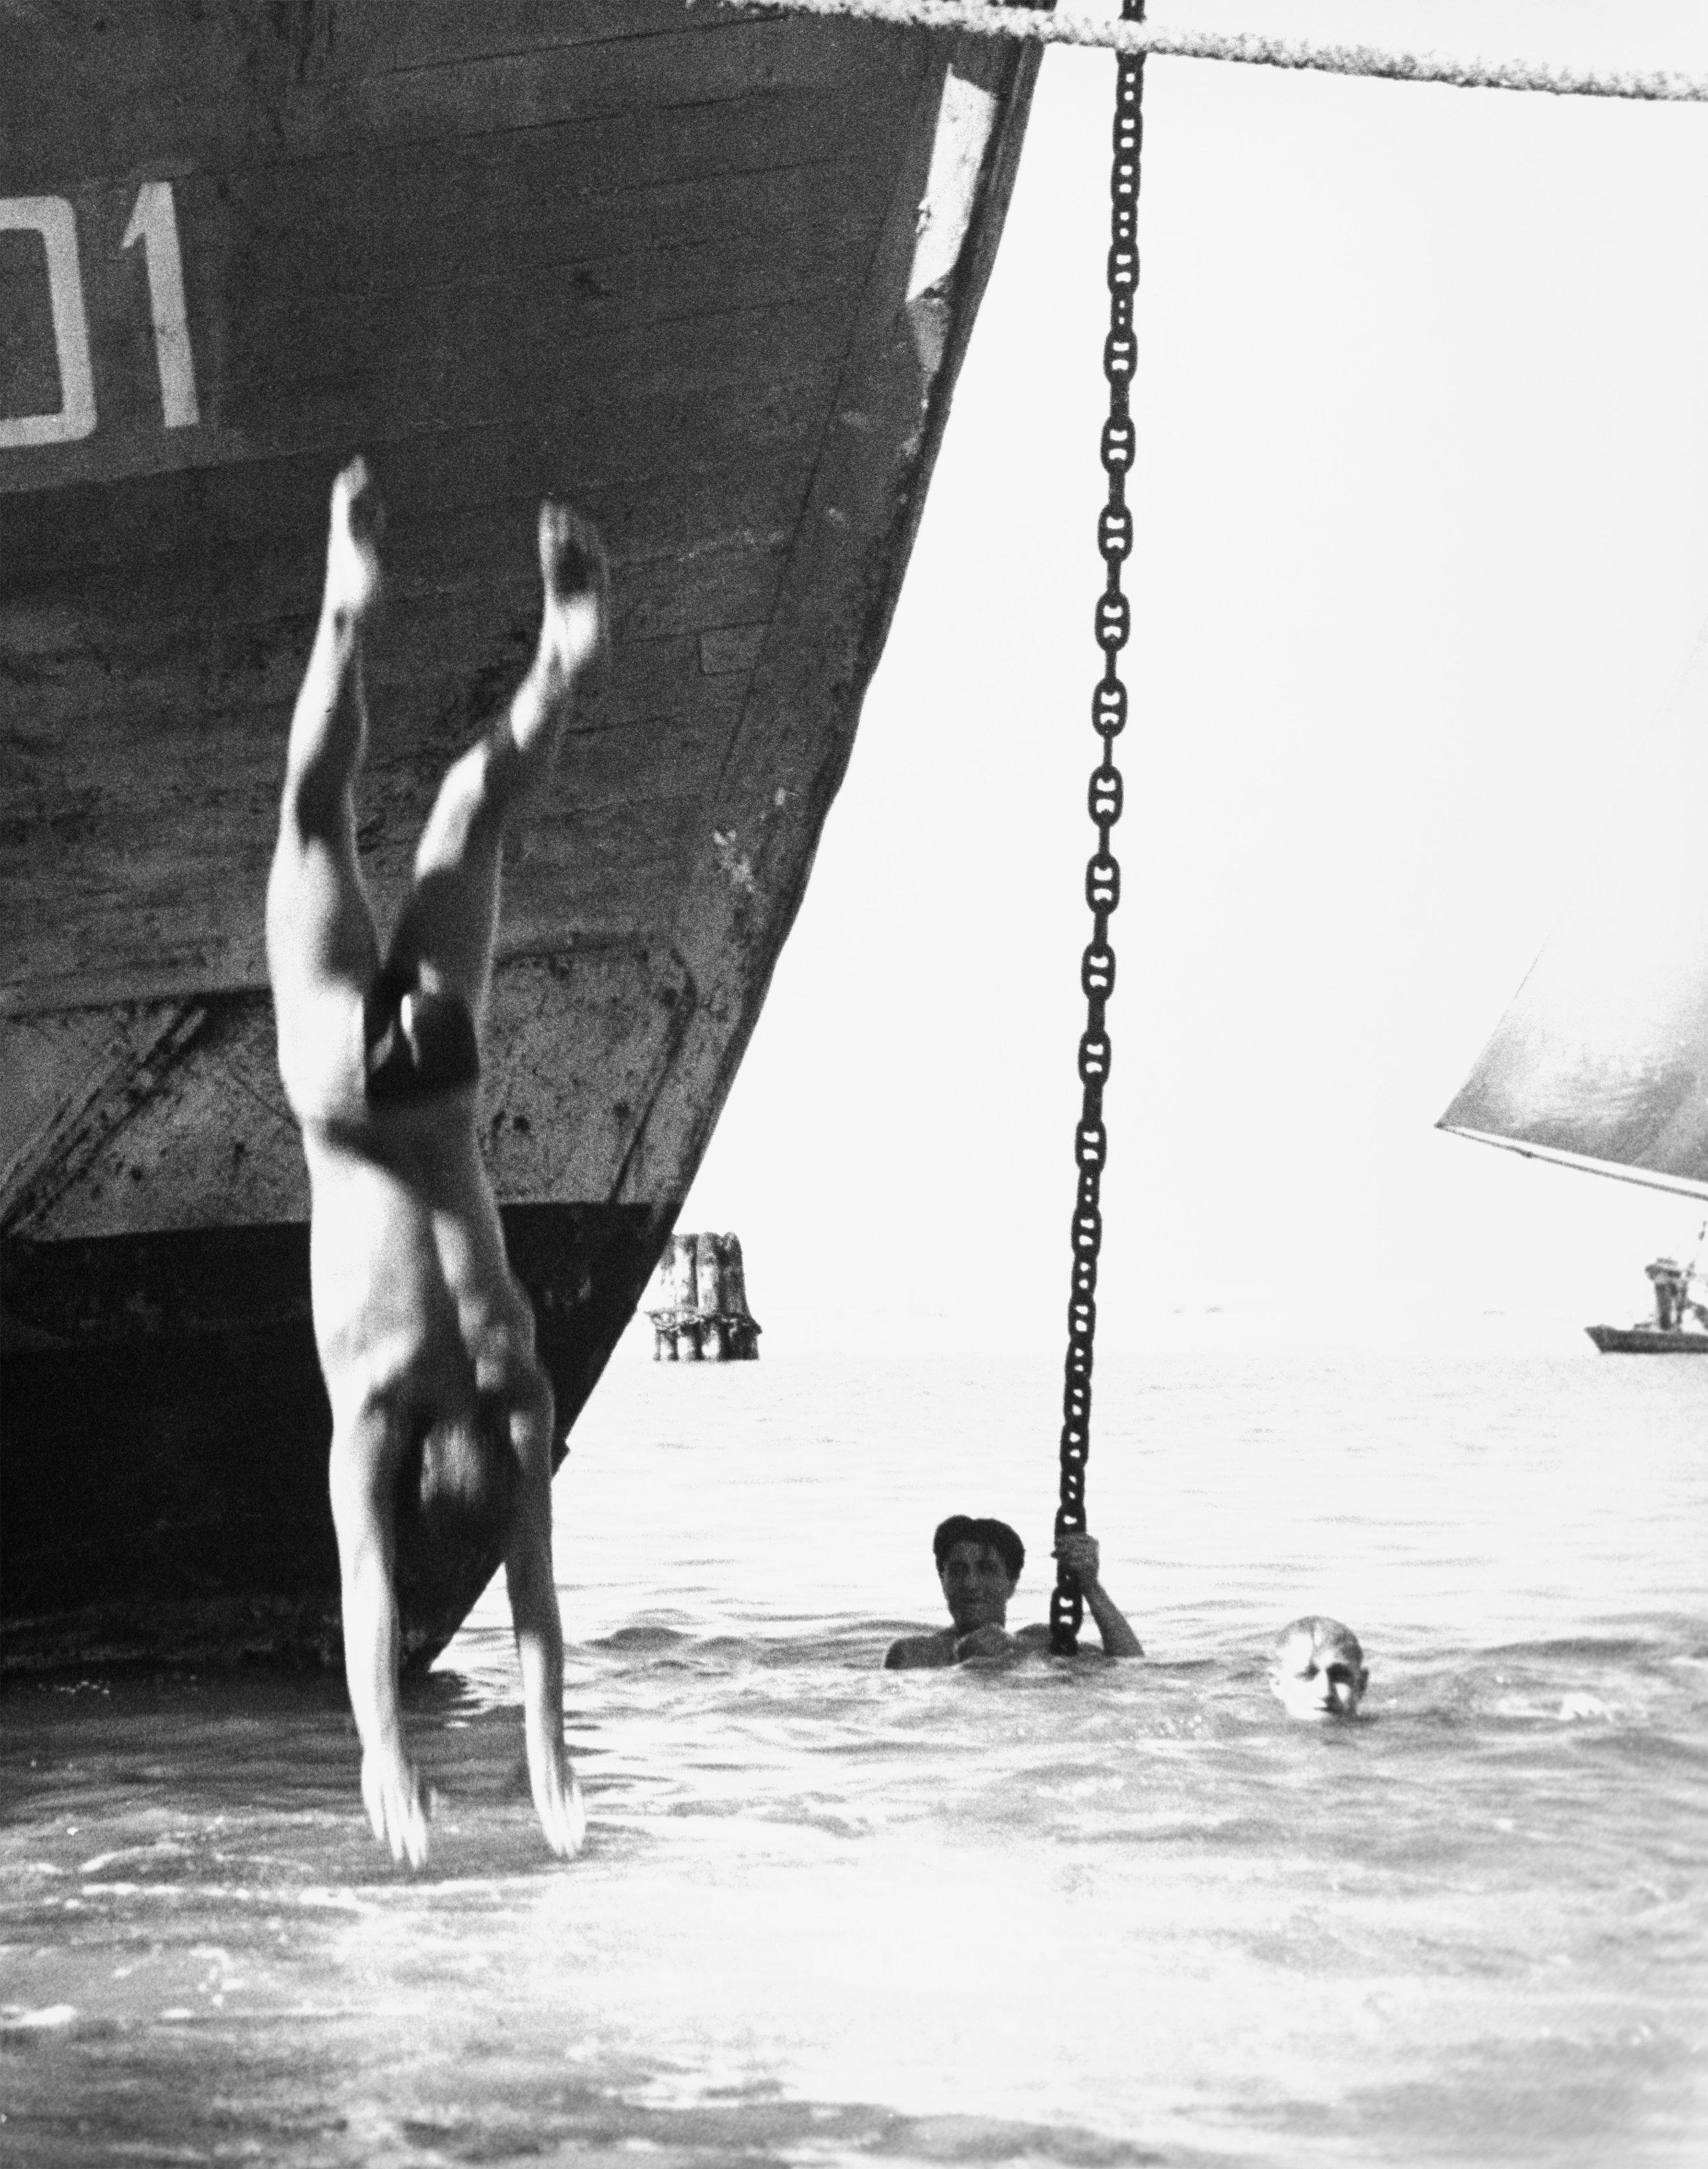 Italy #17, Venice, August 10, 1948